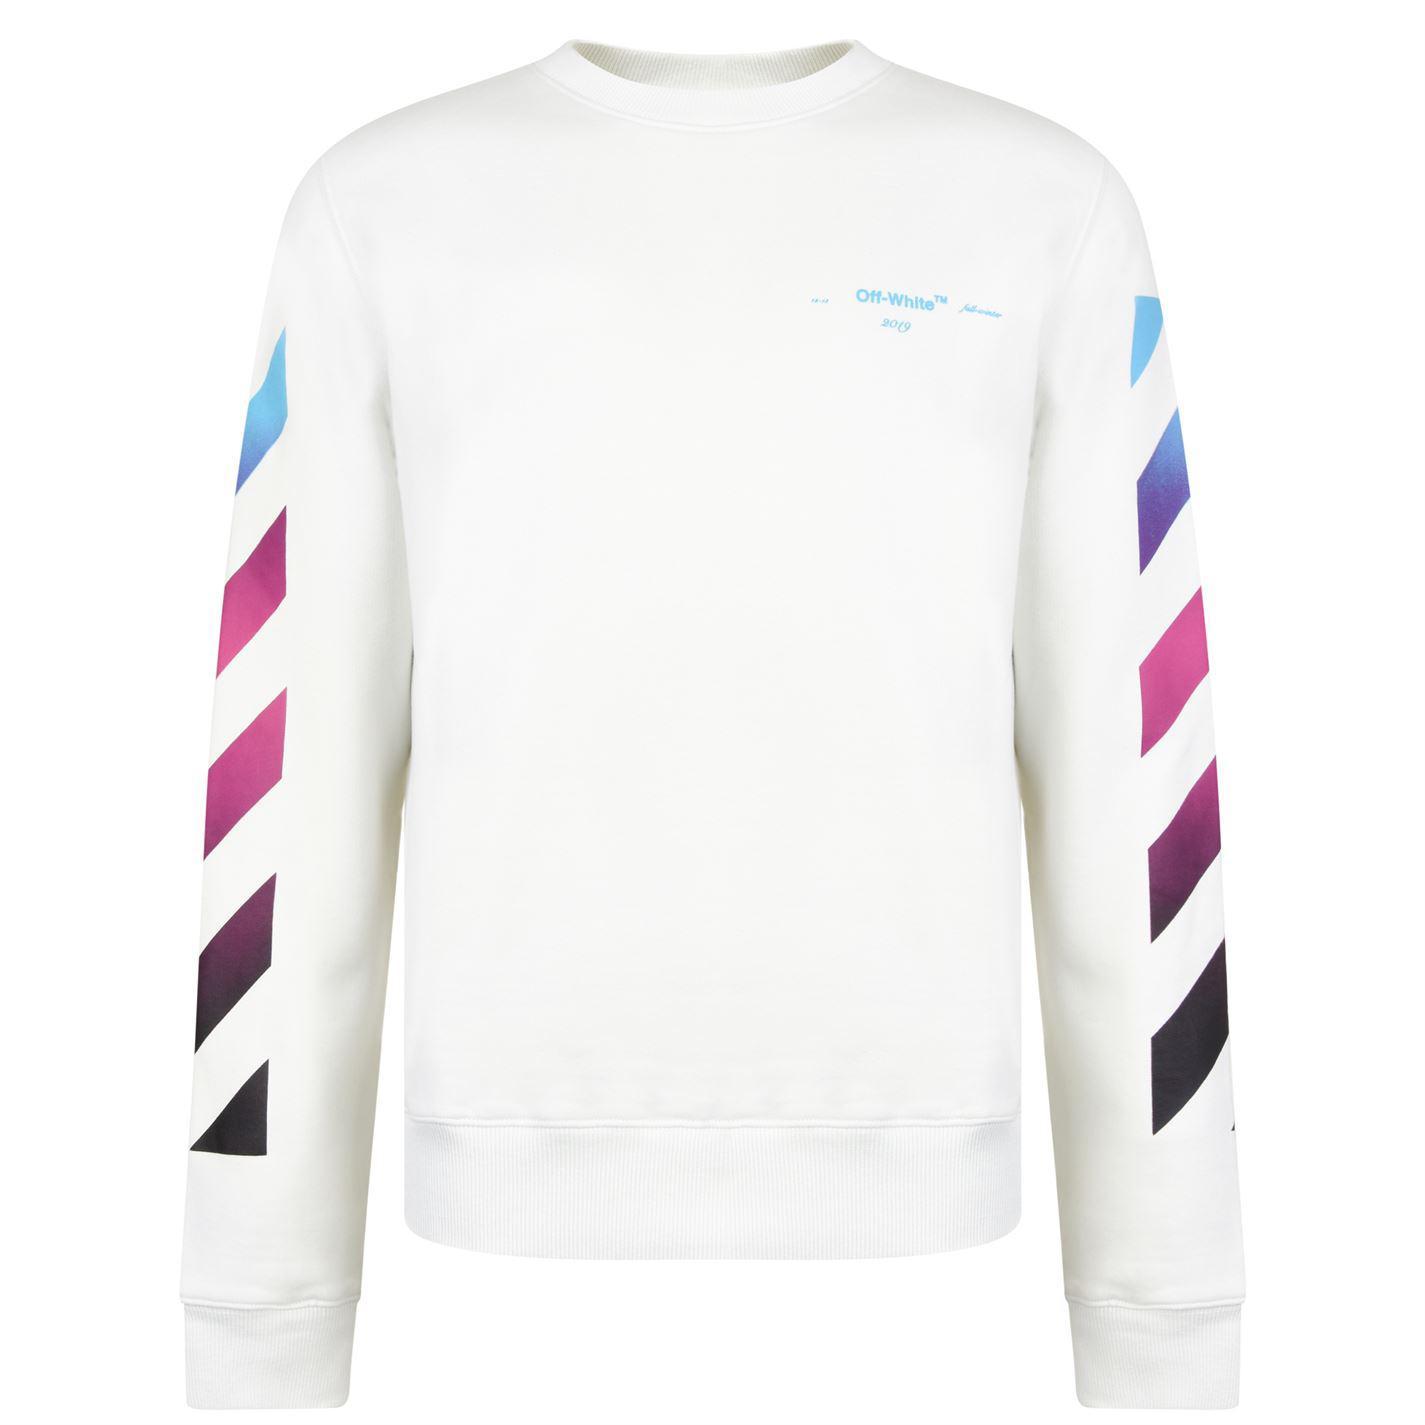 6b04748408f2 Off-White c o Virgil Abloh Gradient Diagonal Sweatshirt for Men - Lyst